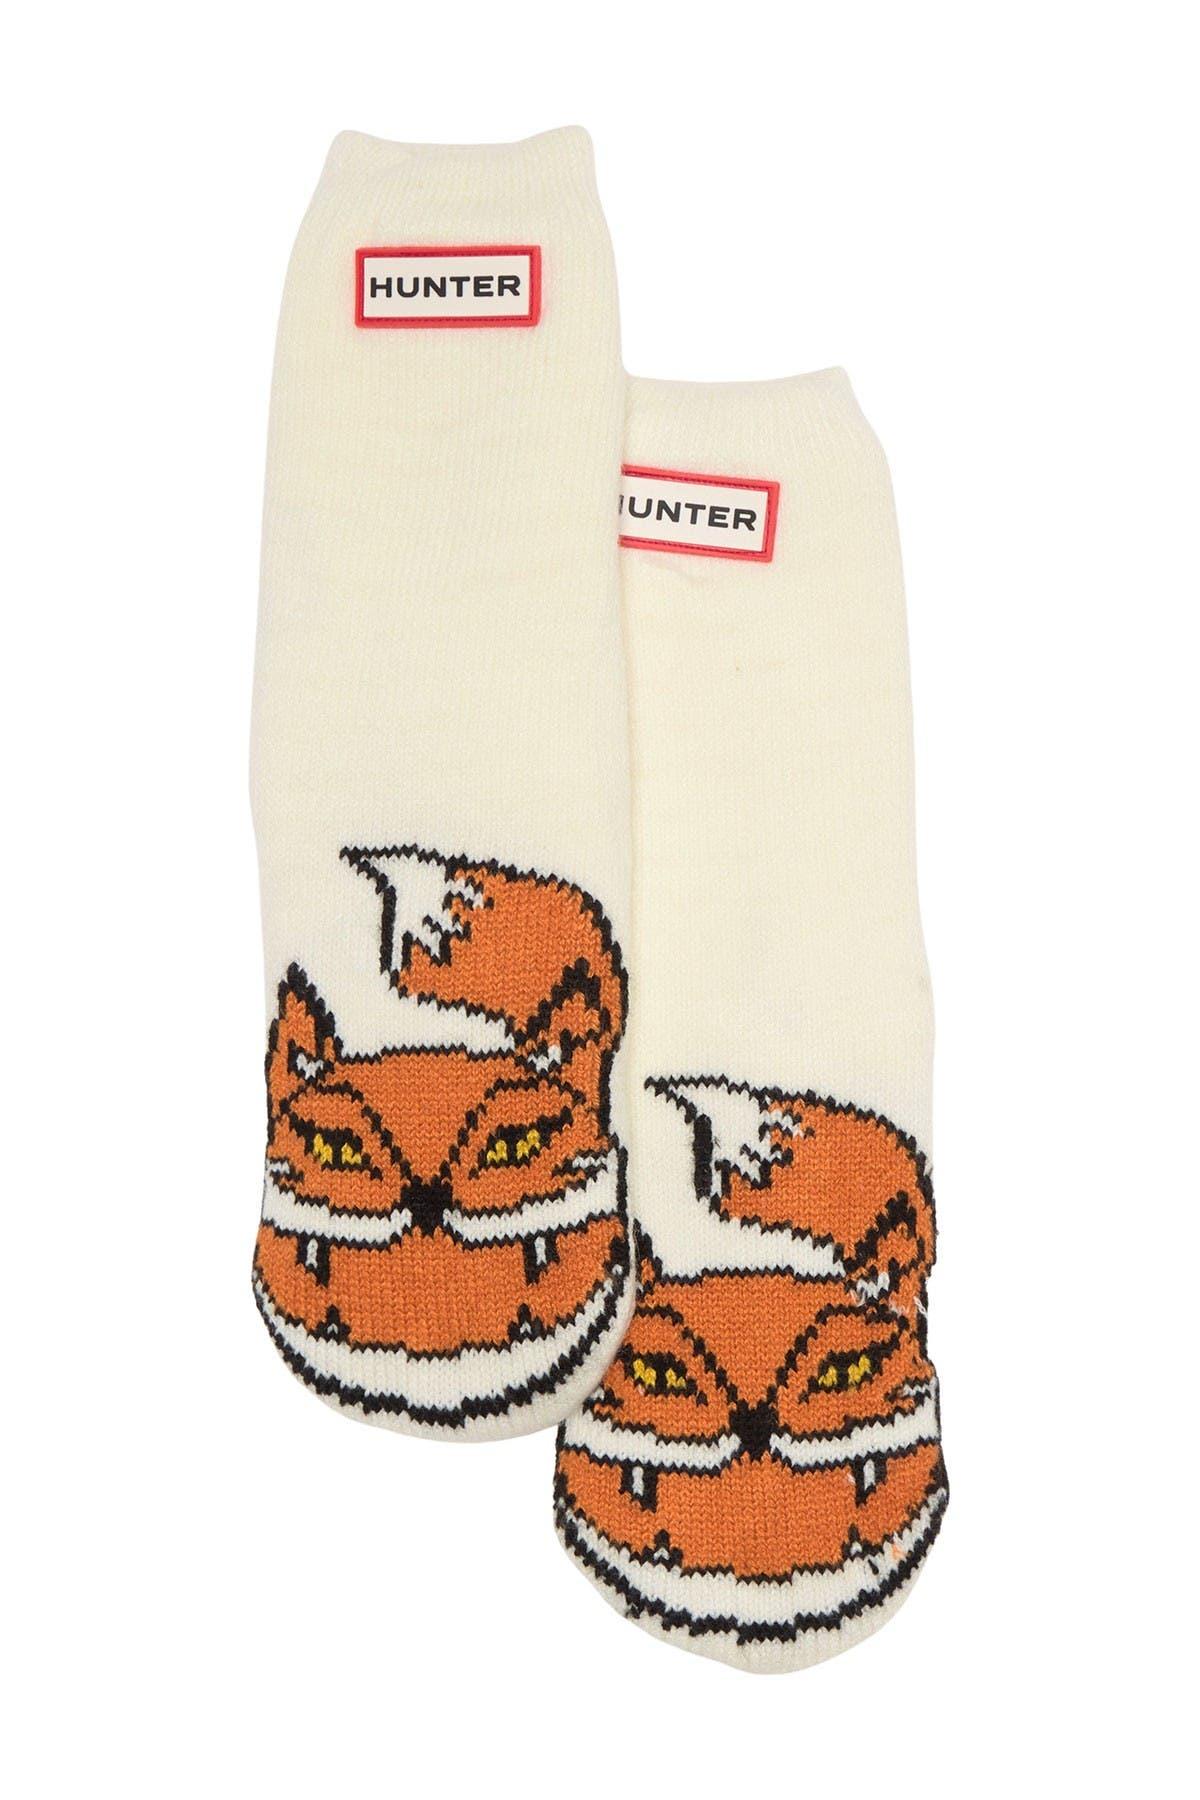 Image of Hunter Cheeky Fox Print Cuff Boot Sock